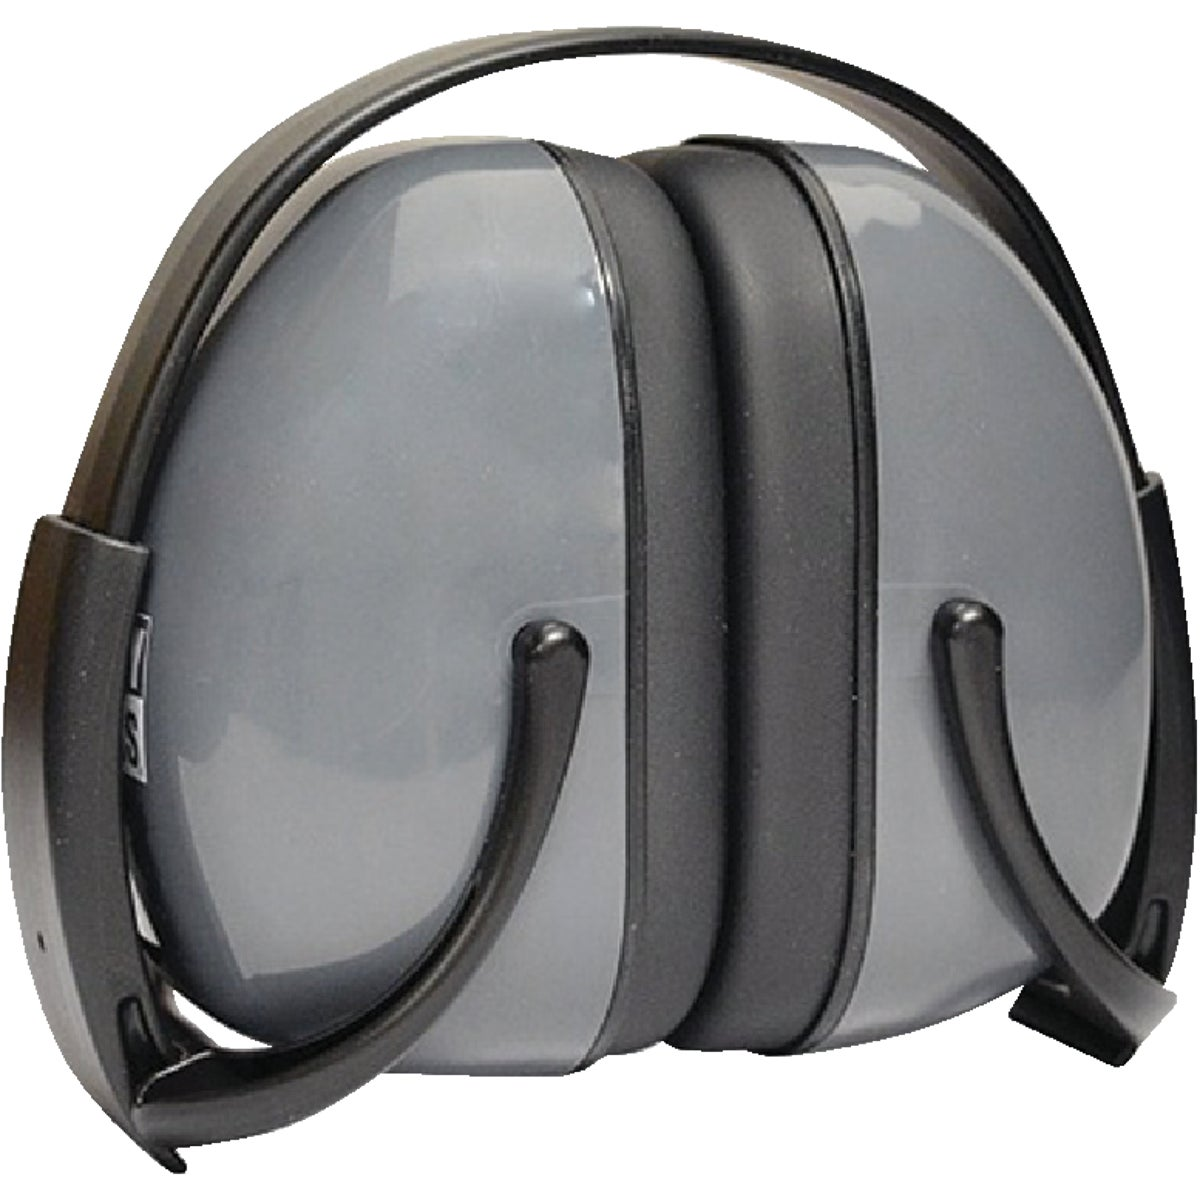 FOLDABLE EARMUFFS - 10033236 by Msa Safety